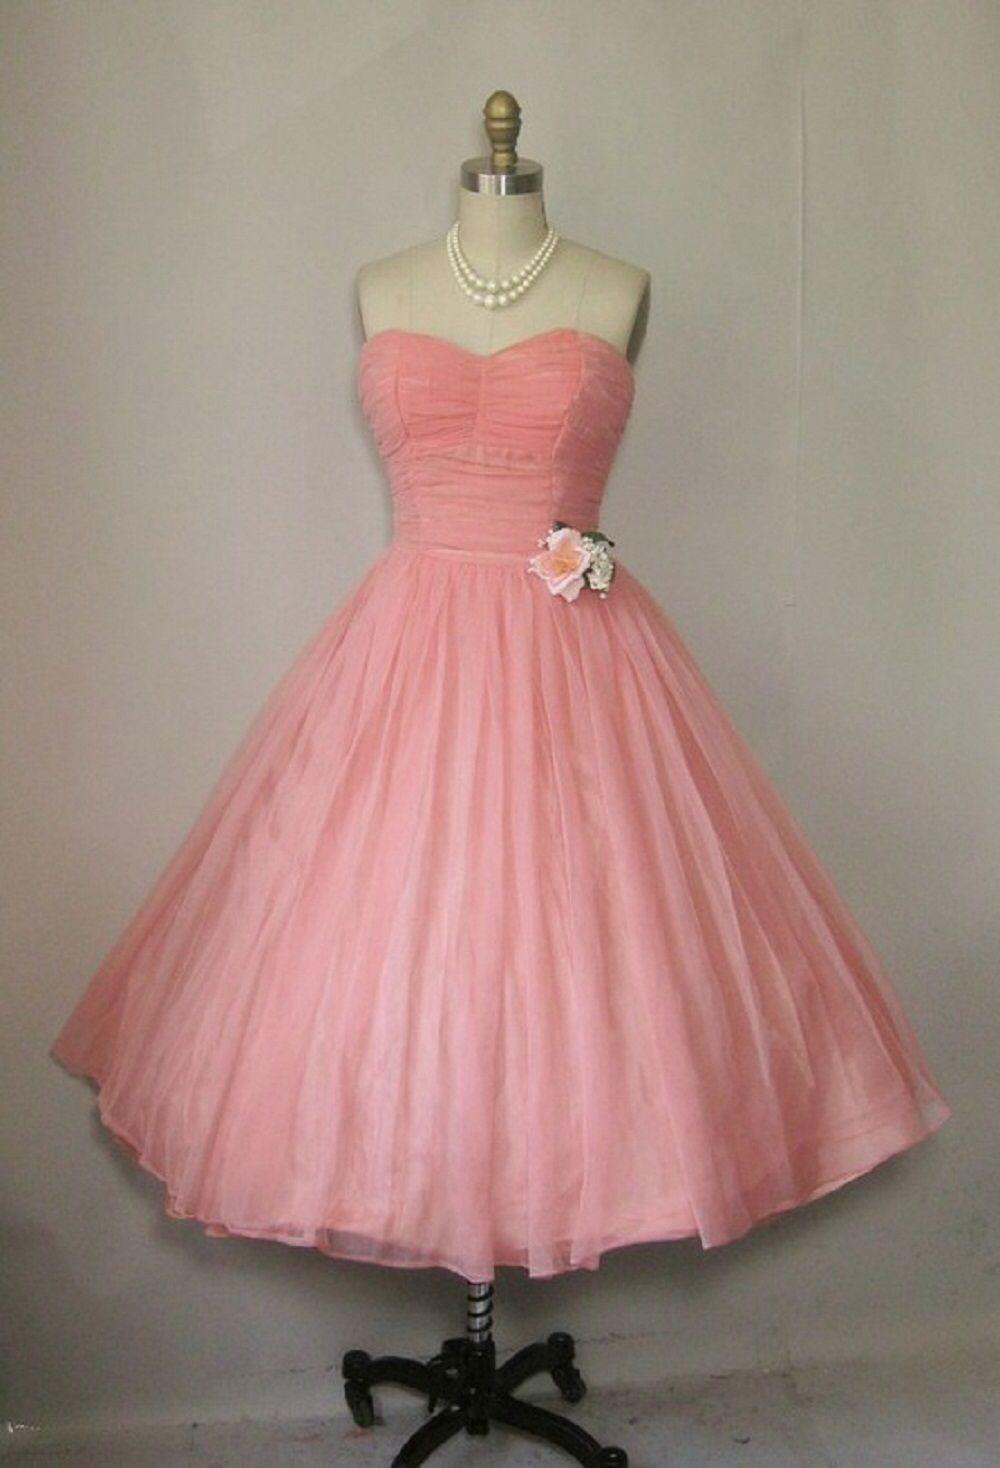 Dancing Queen Prom Dresses Vintage Vintage 1950s Dresses Vintage 1950s Dresses Parties [ 1468 x 1000 Pixel ]